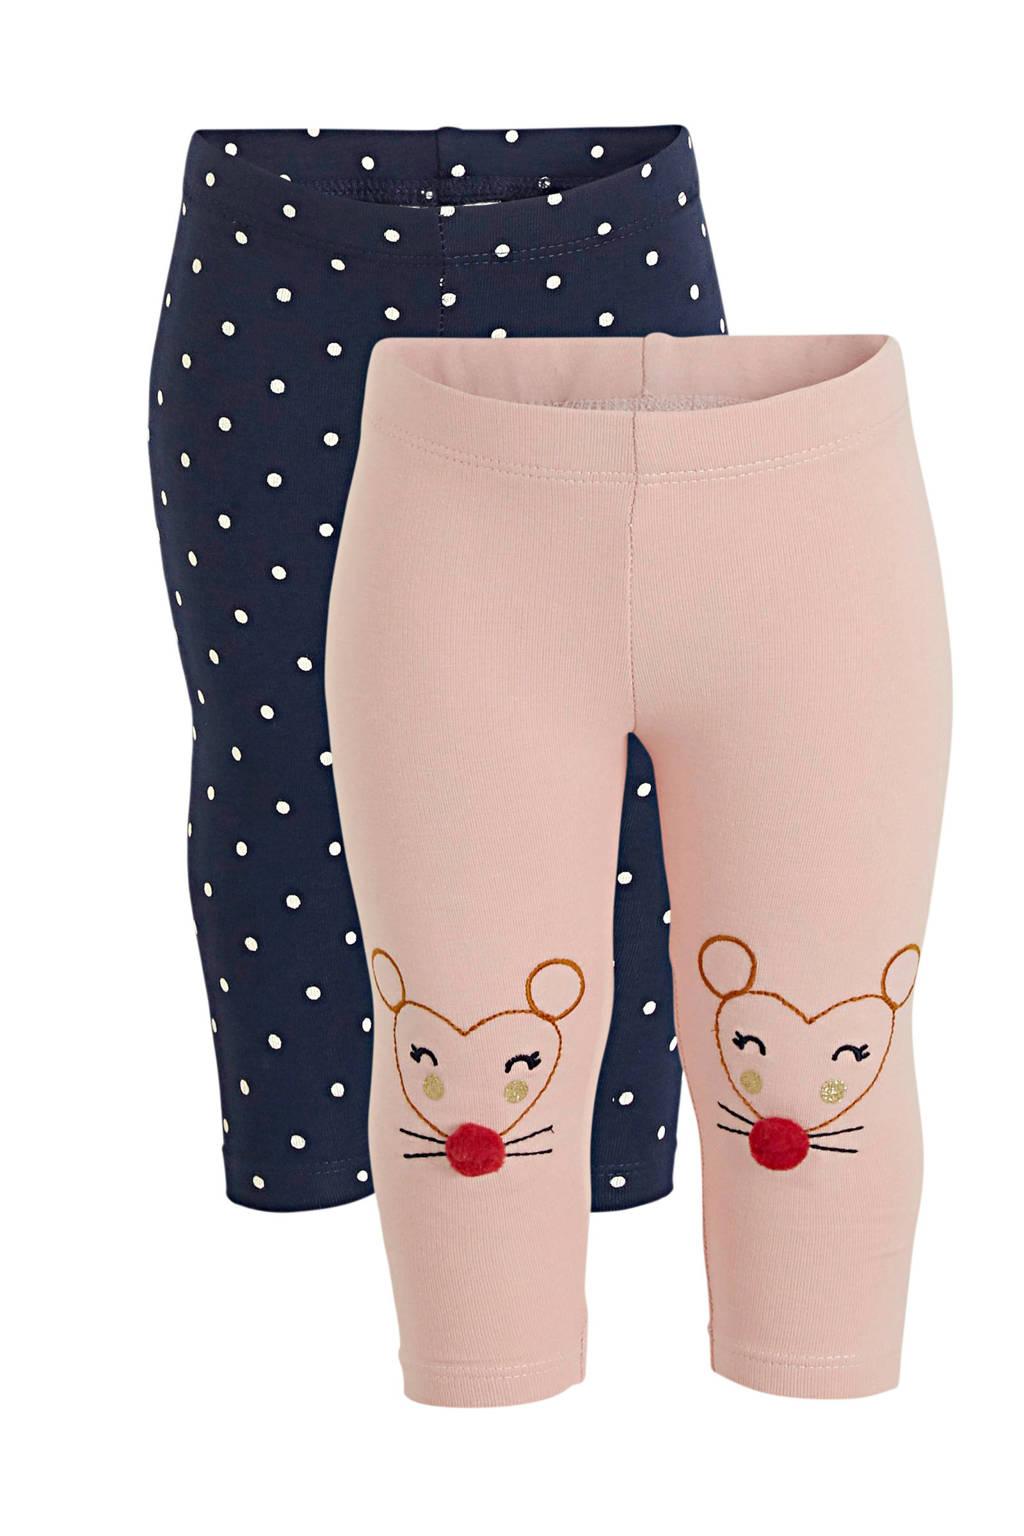 C&A Baby Club legging - set van 2 roze/donkerblauw, Roze/donkerblauw